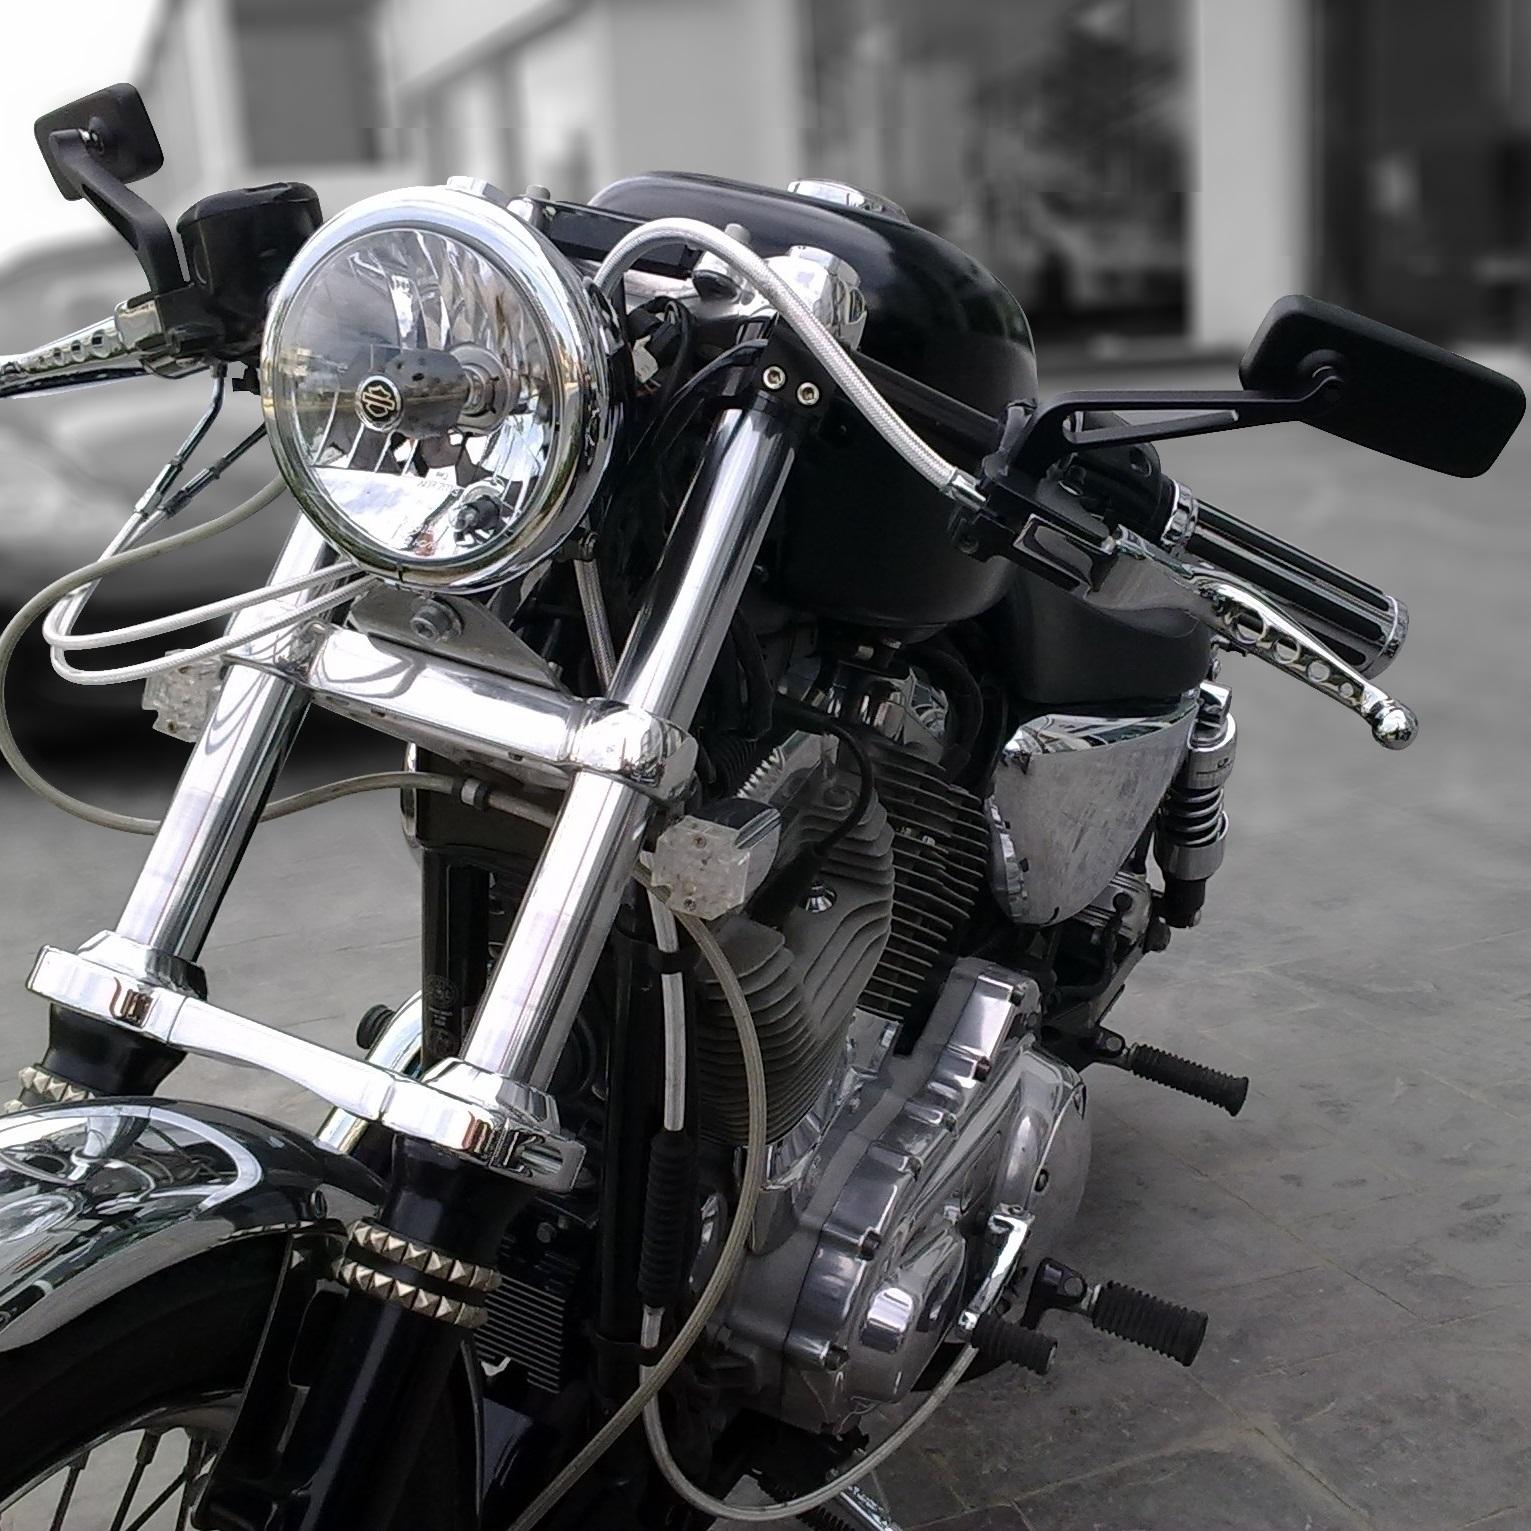 mirrors motorcycle rectangle bike 10mm motorbike ryde 8mm pair harley universal